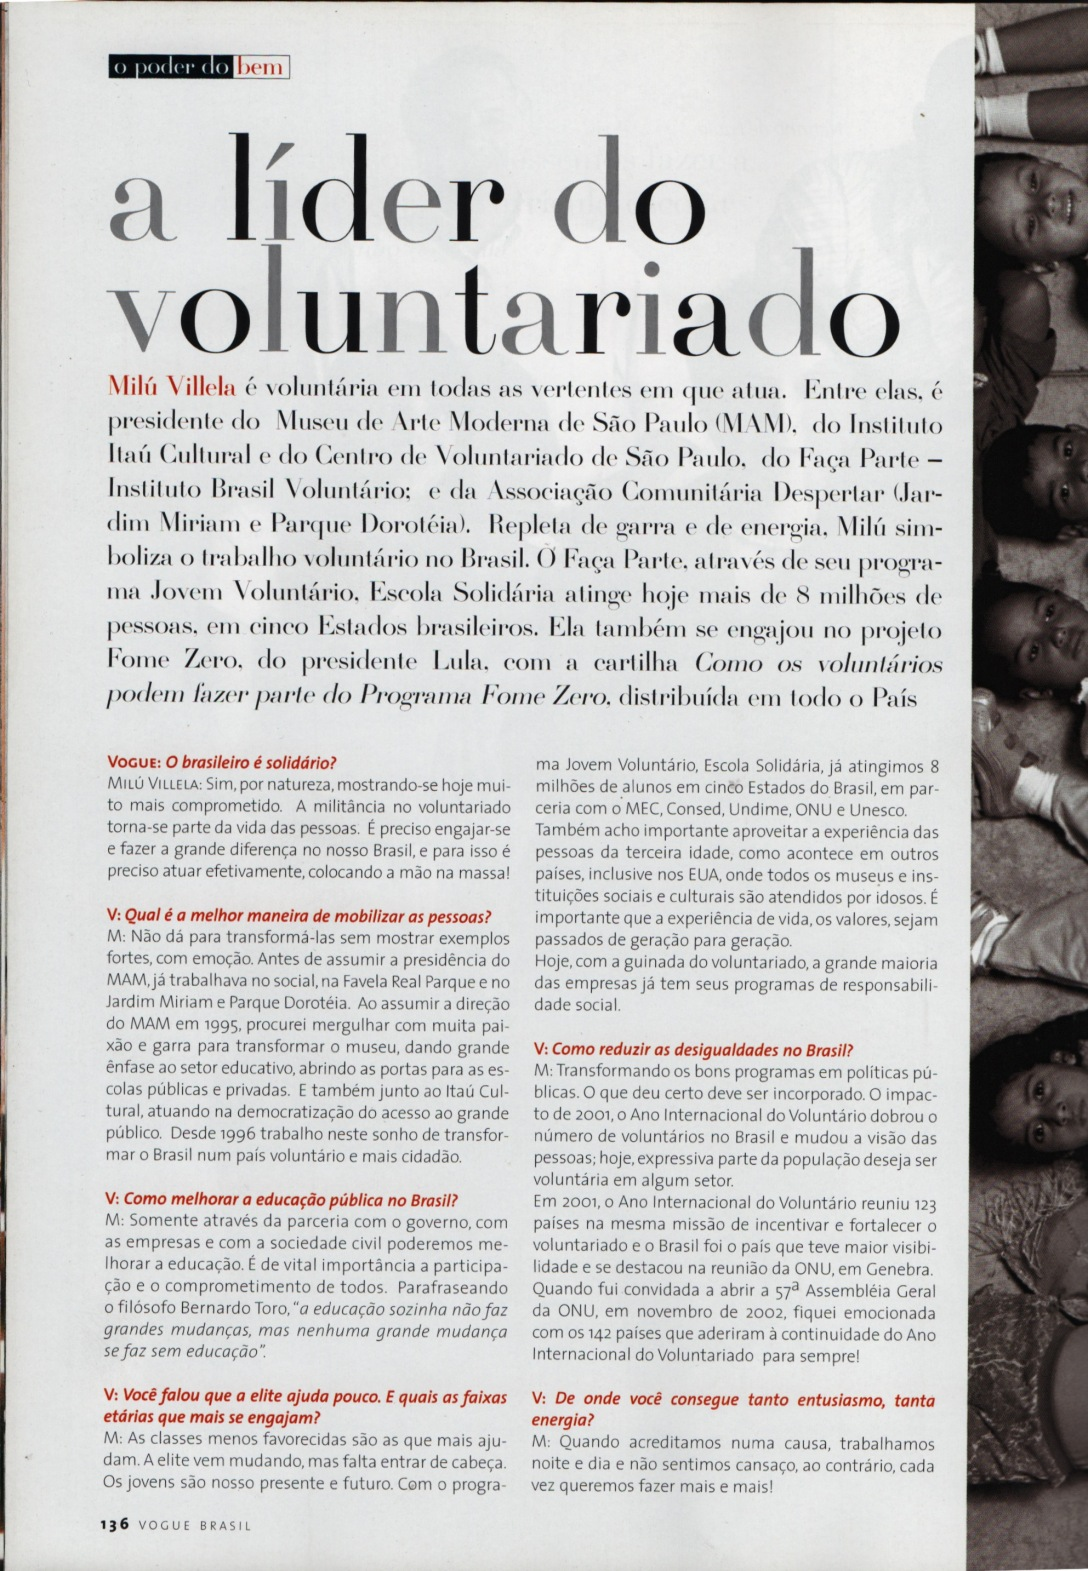 2003 Vogue Milu Vilela